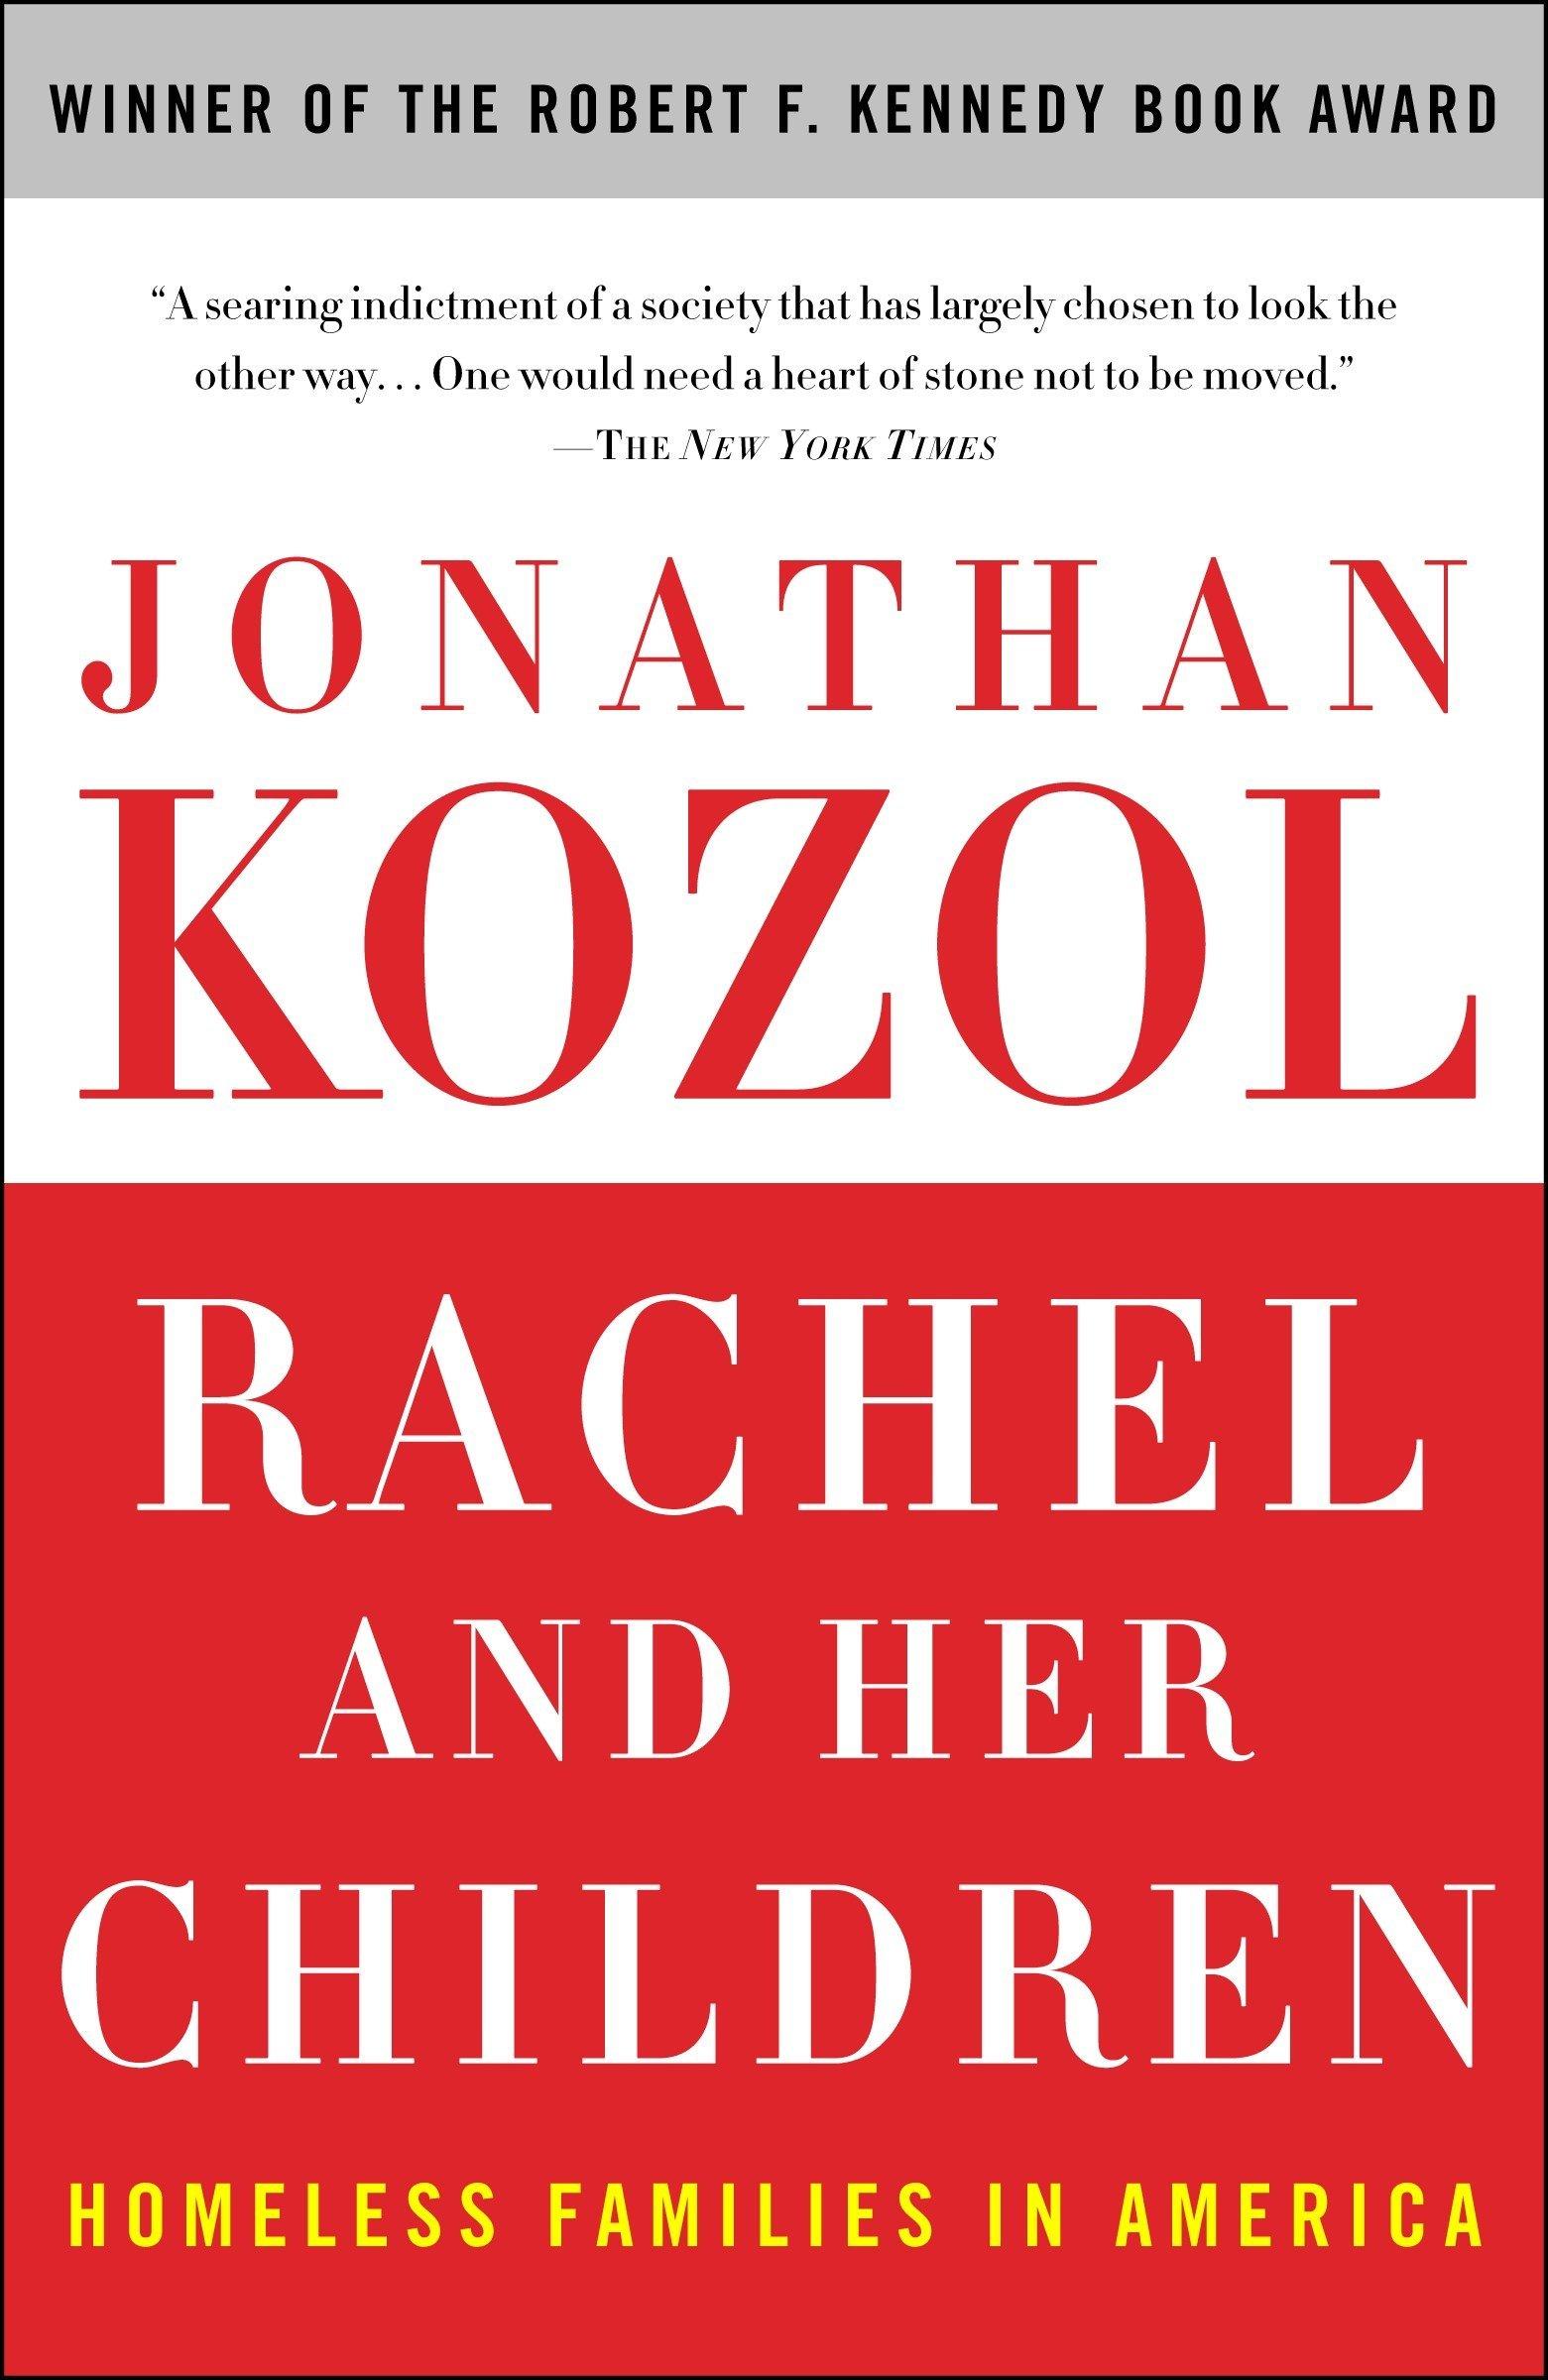 Rachel And Her Children Homeless Families In America Jonathan